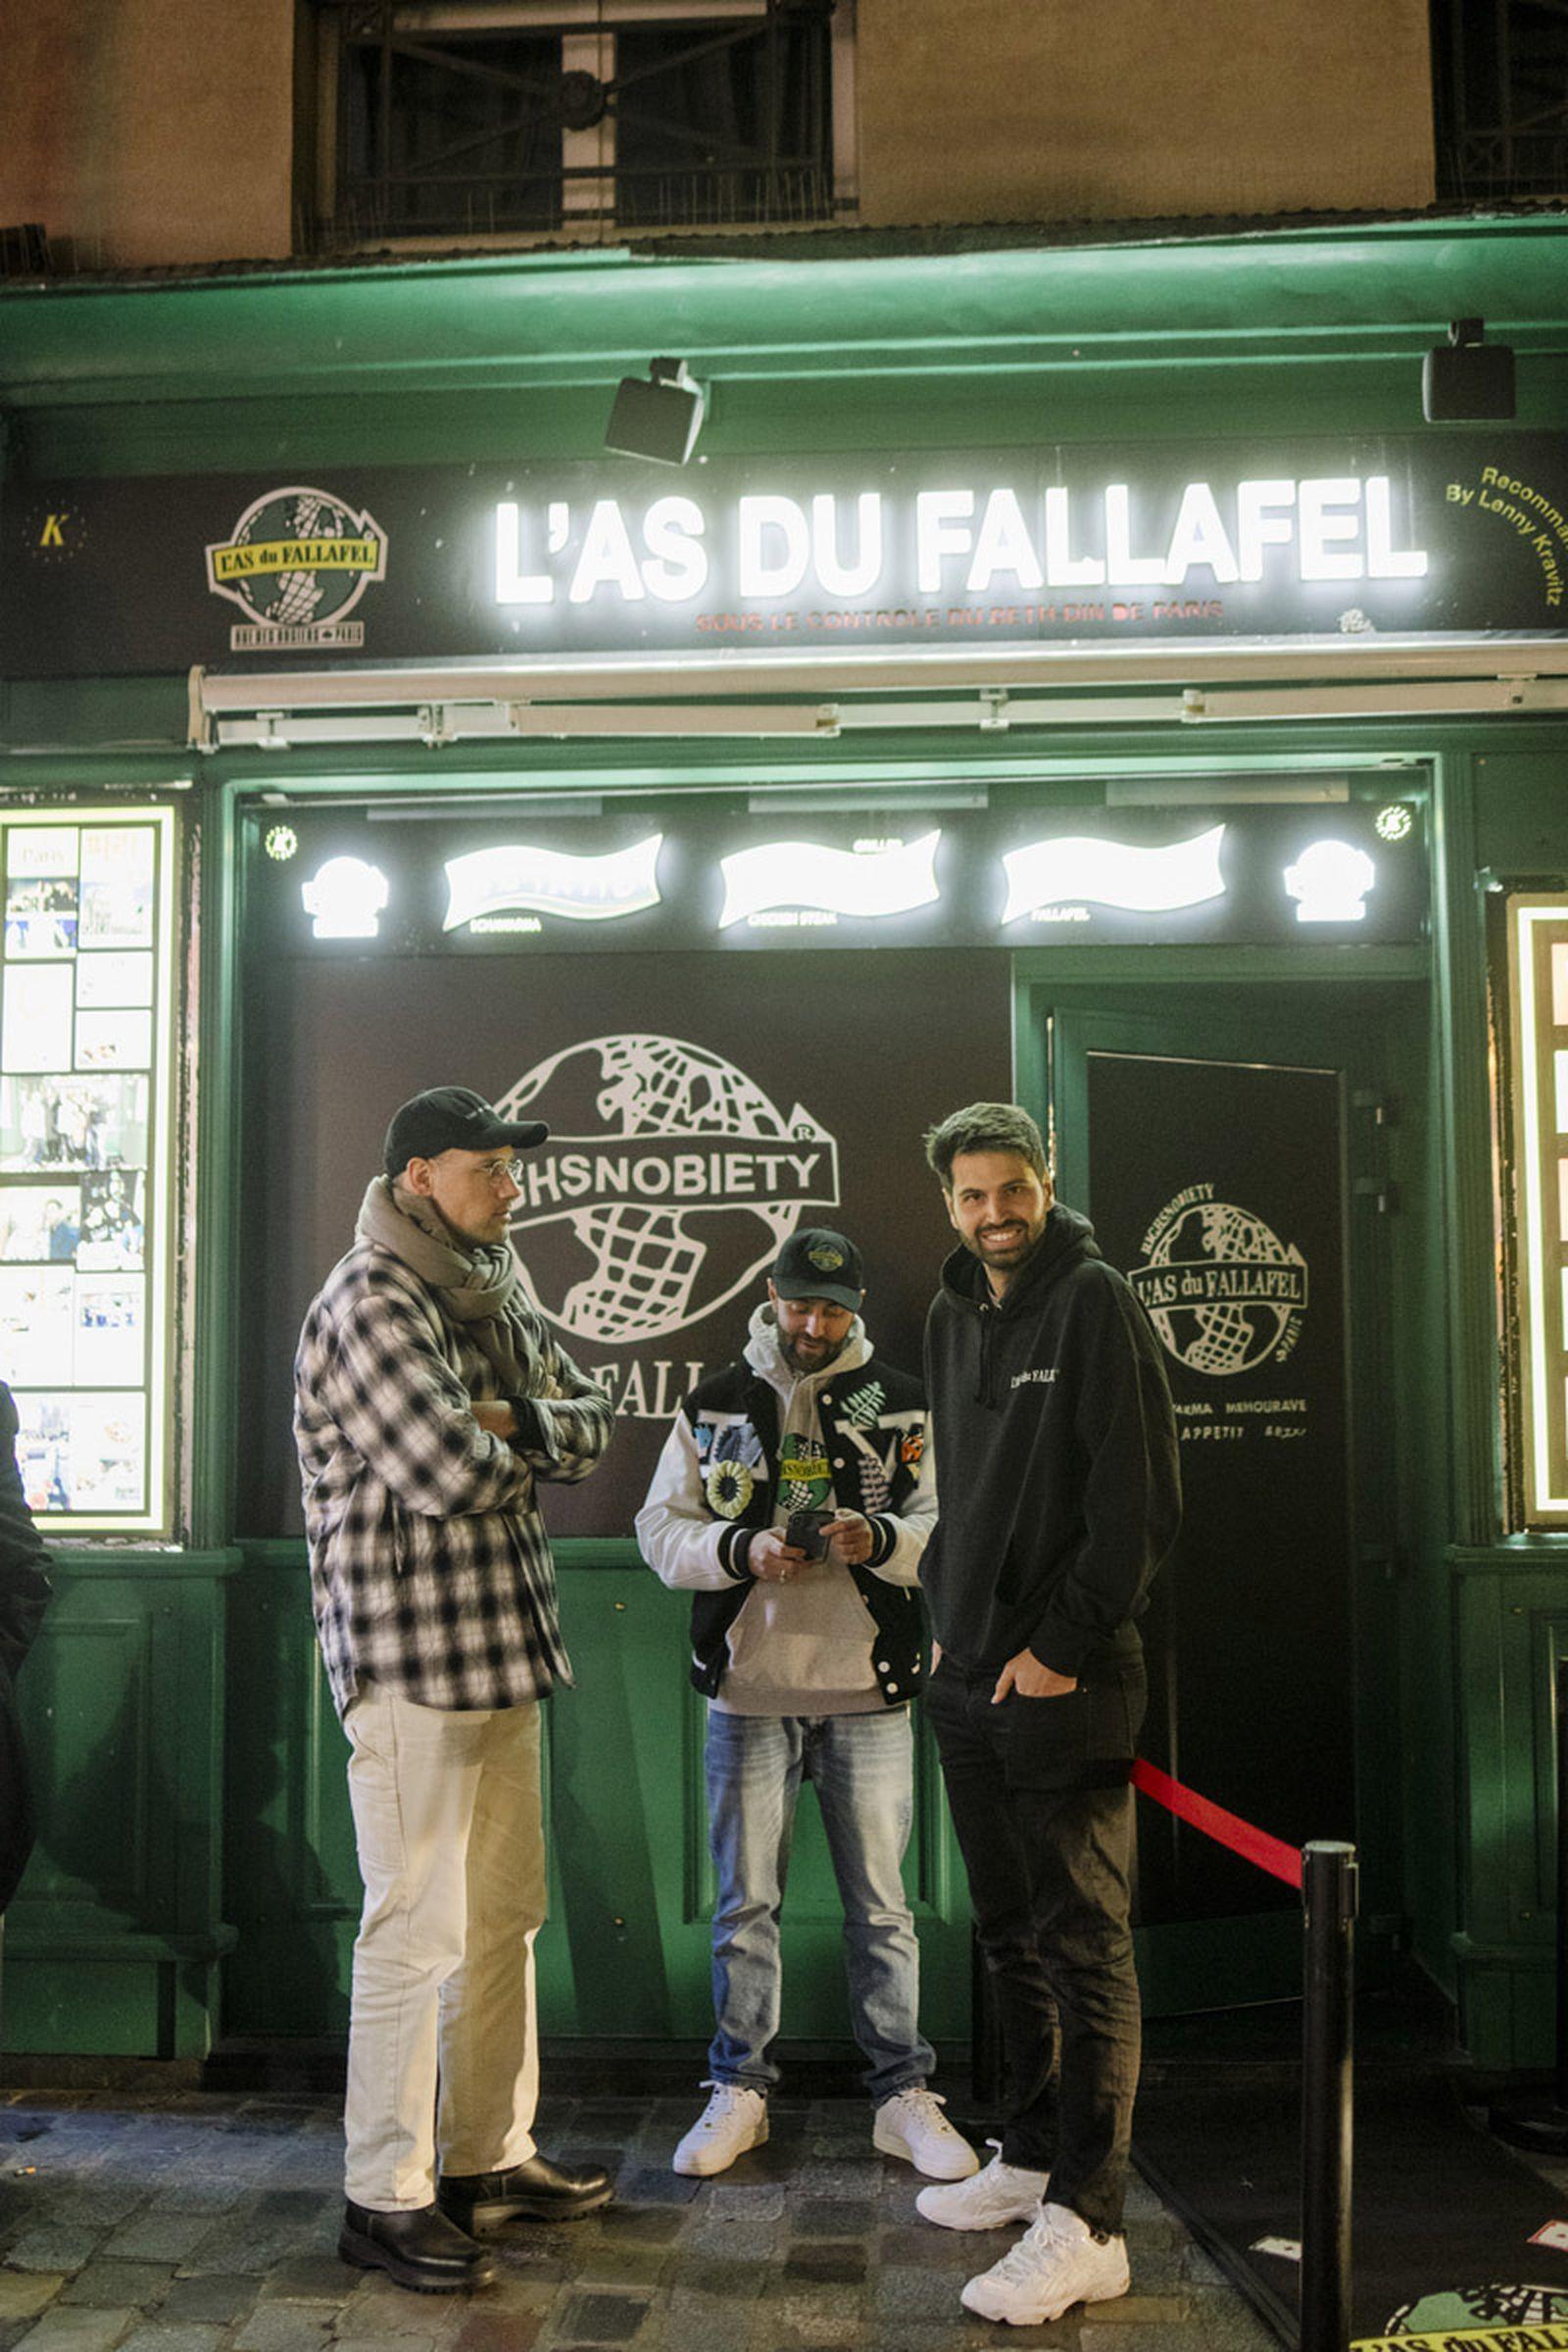 highsnobiety-las-du-fallafel-collection-08